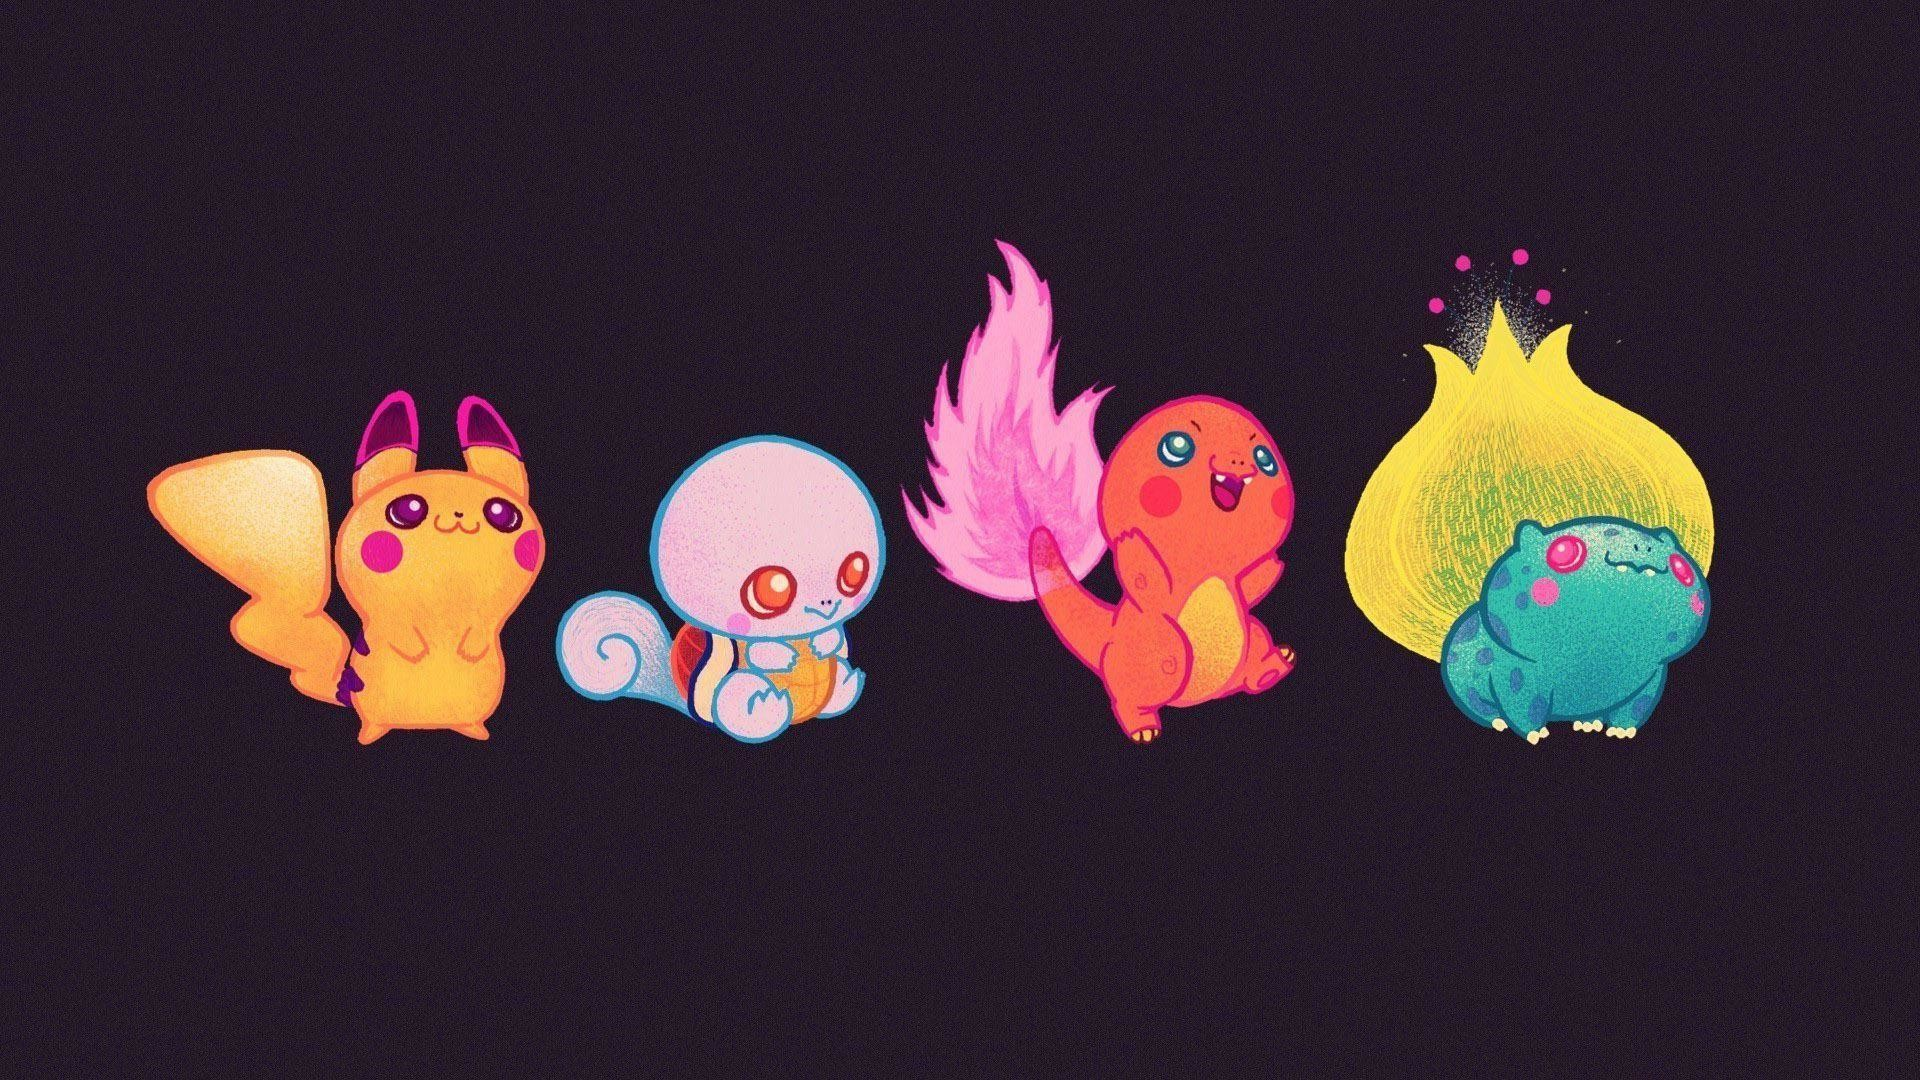 cute-baby-pokemon-15312 Pikachu Wallpapers HD free wallpapers .